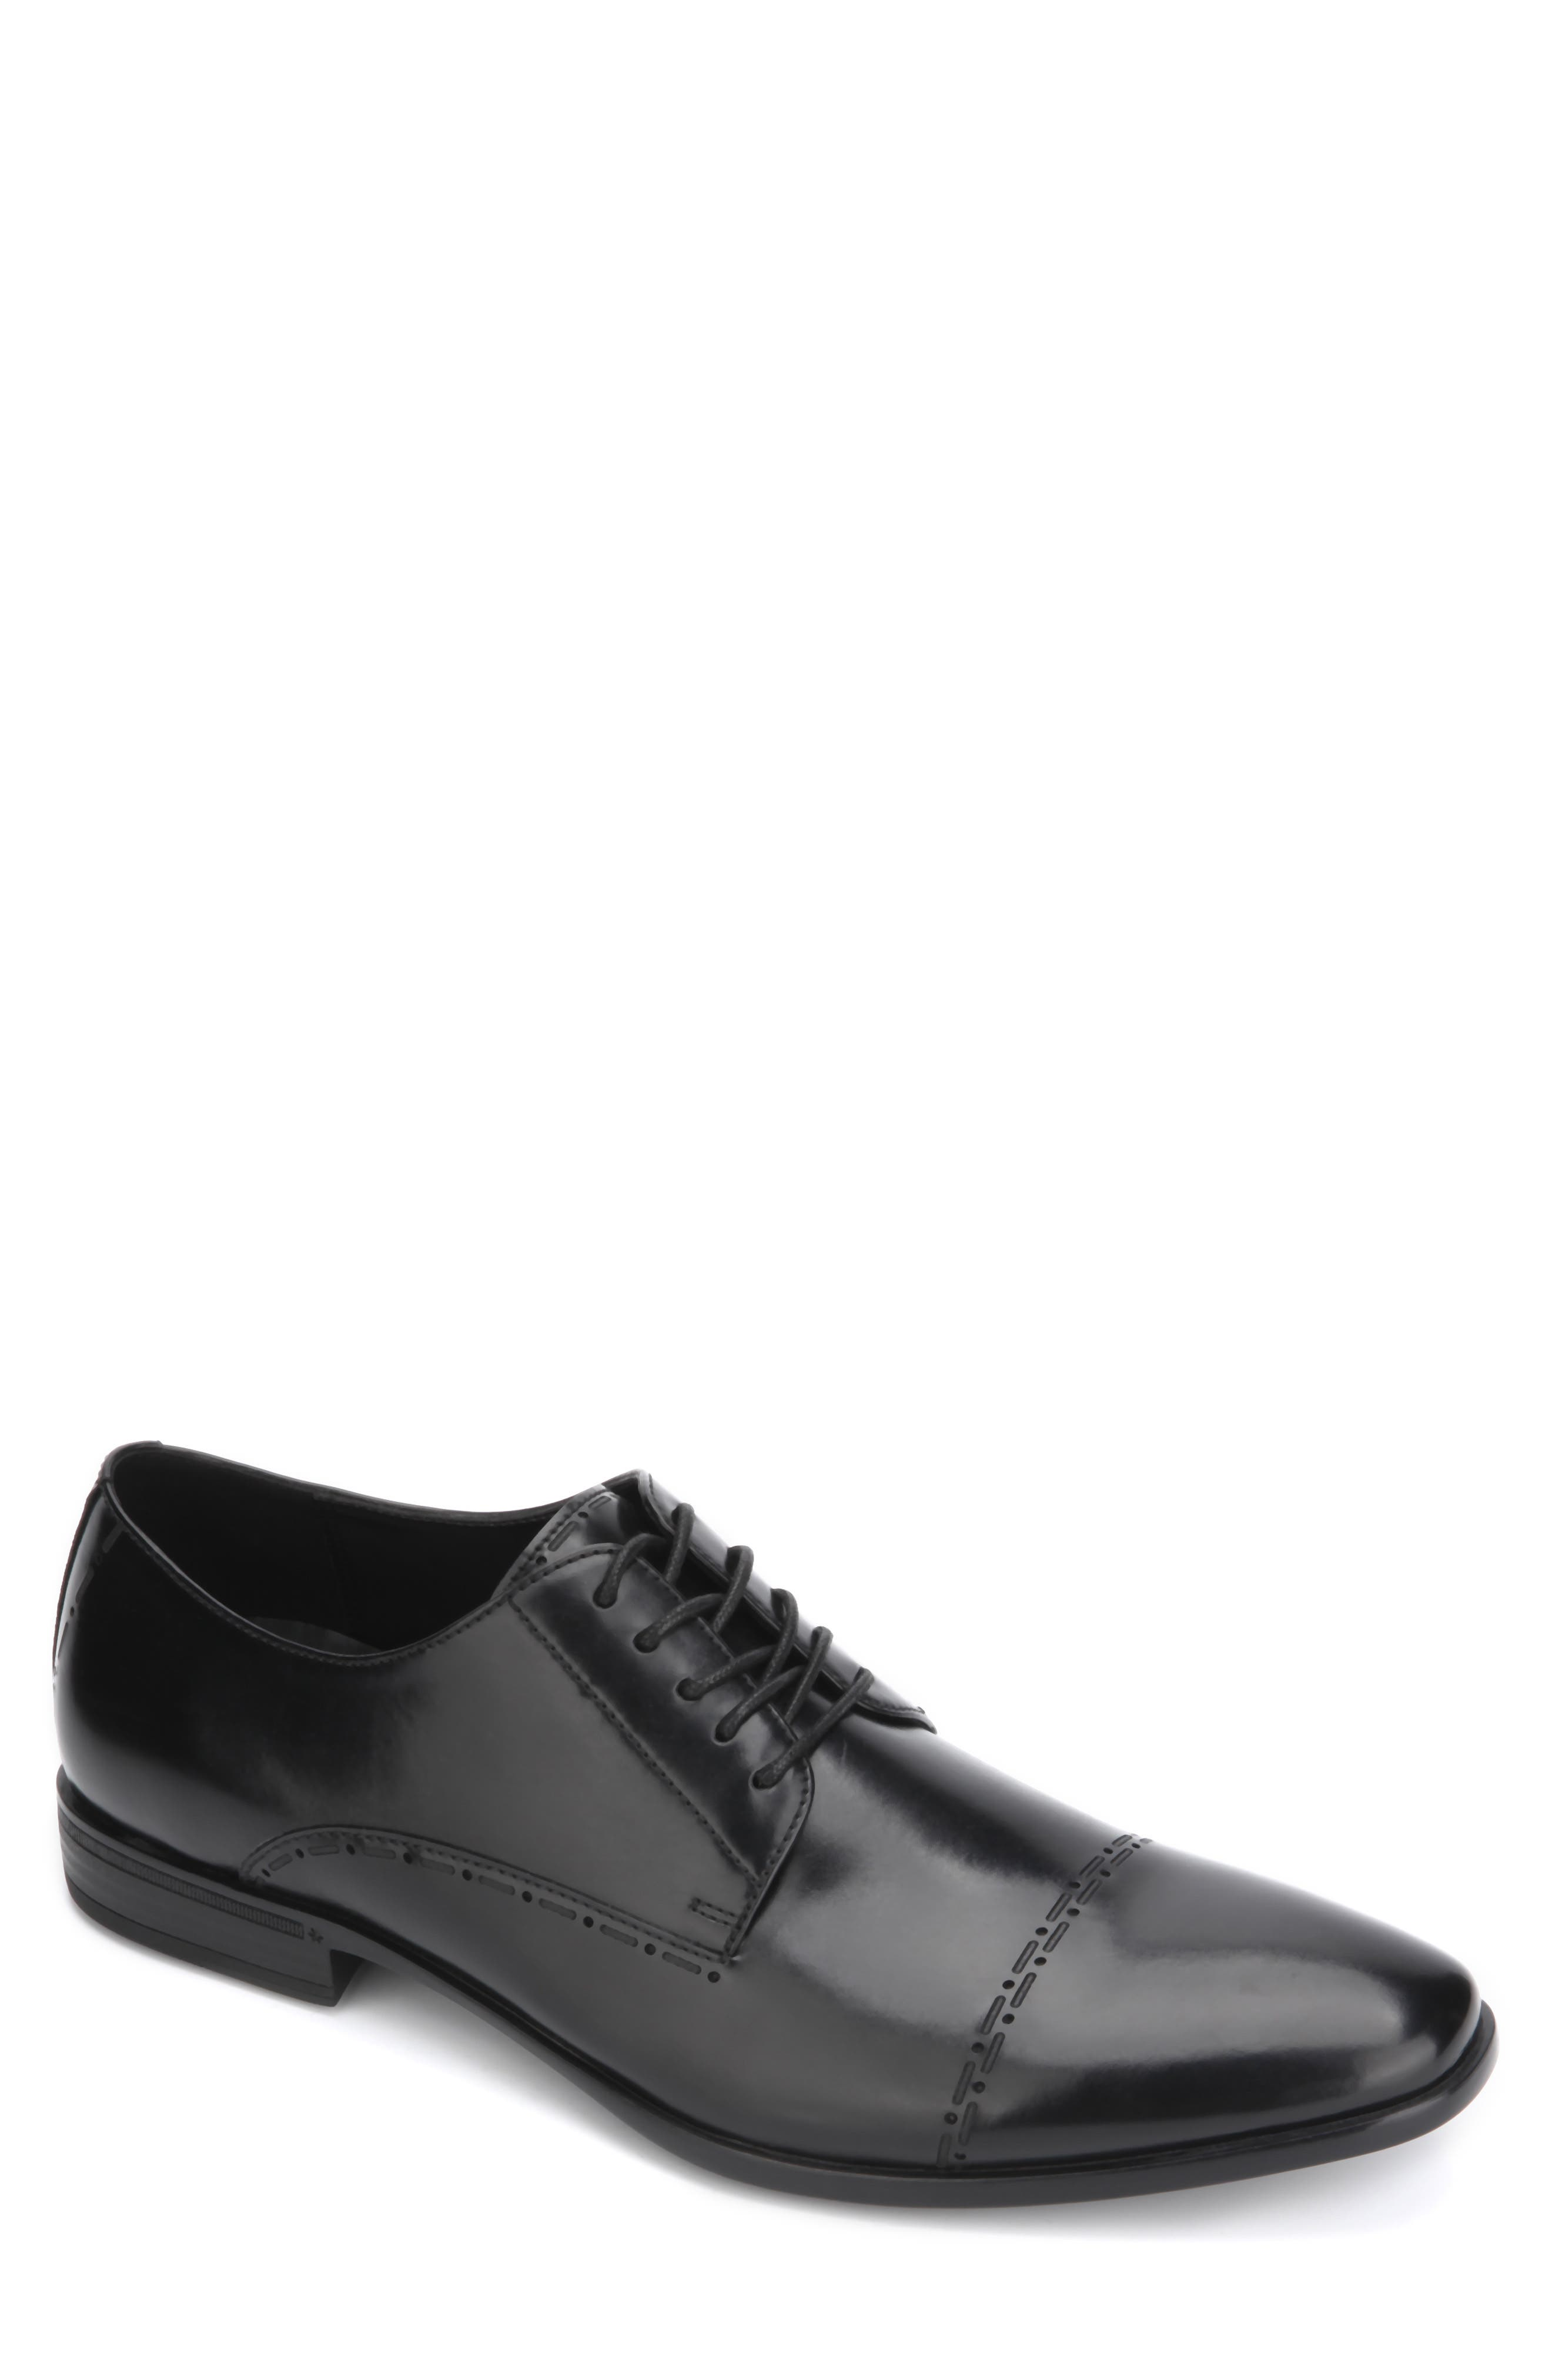 Kenneth Cole Eddy Shoe In Black